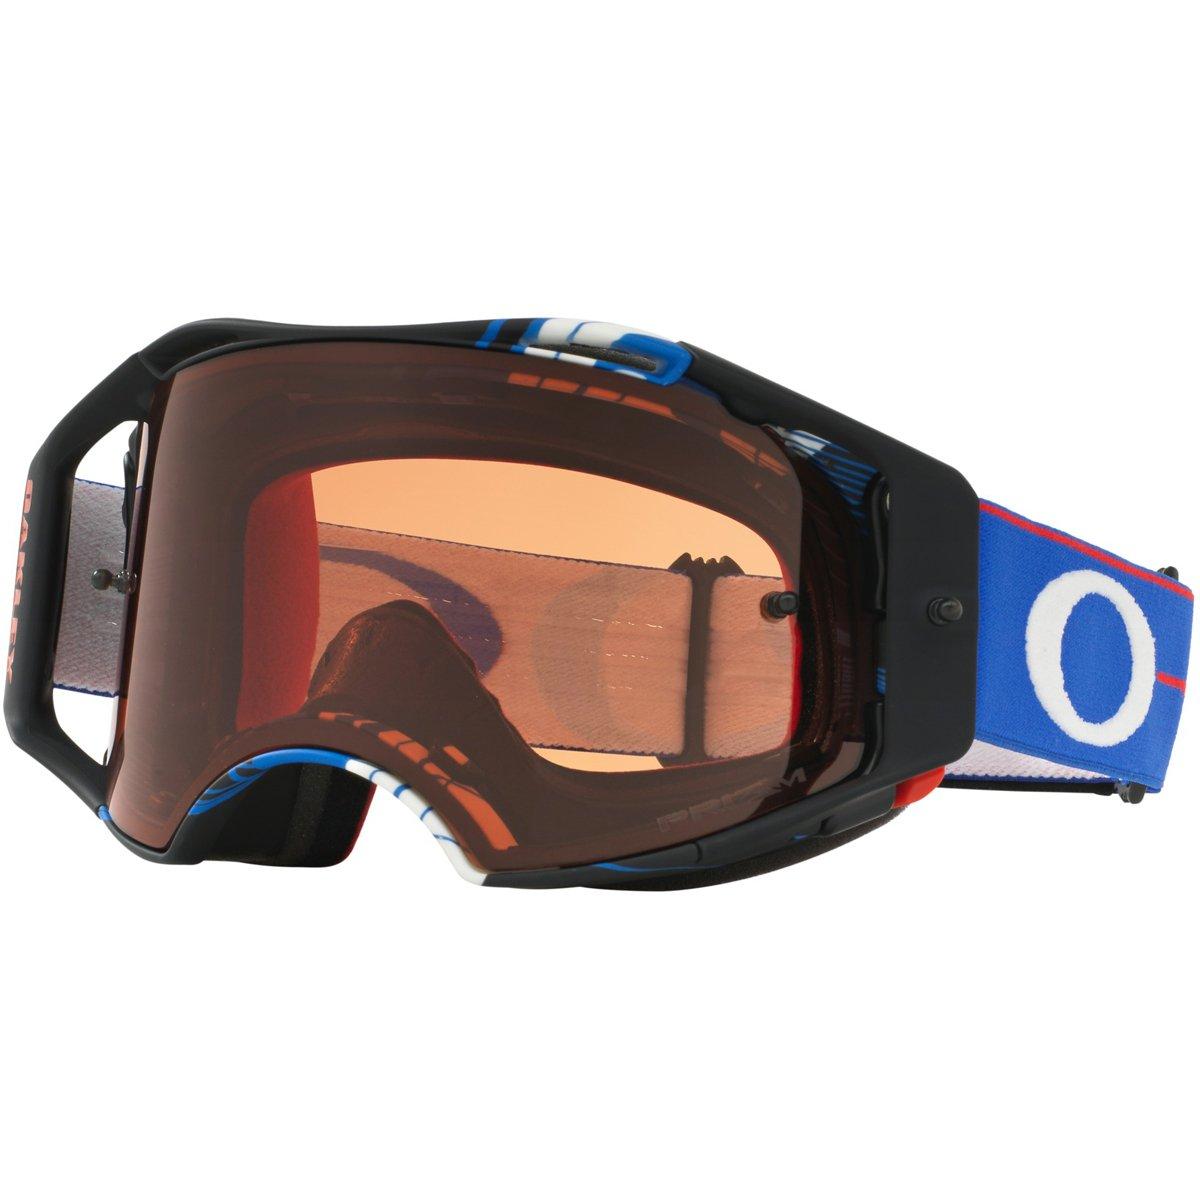 Oakley Airbrake MX Ryan Dungey Adult Off-Road Motorcycle Goggles Eyewear - Block Pass RWB/Prizm MX Bronze/One Size Fits All